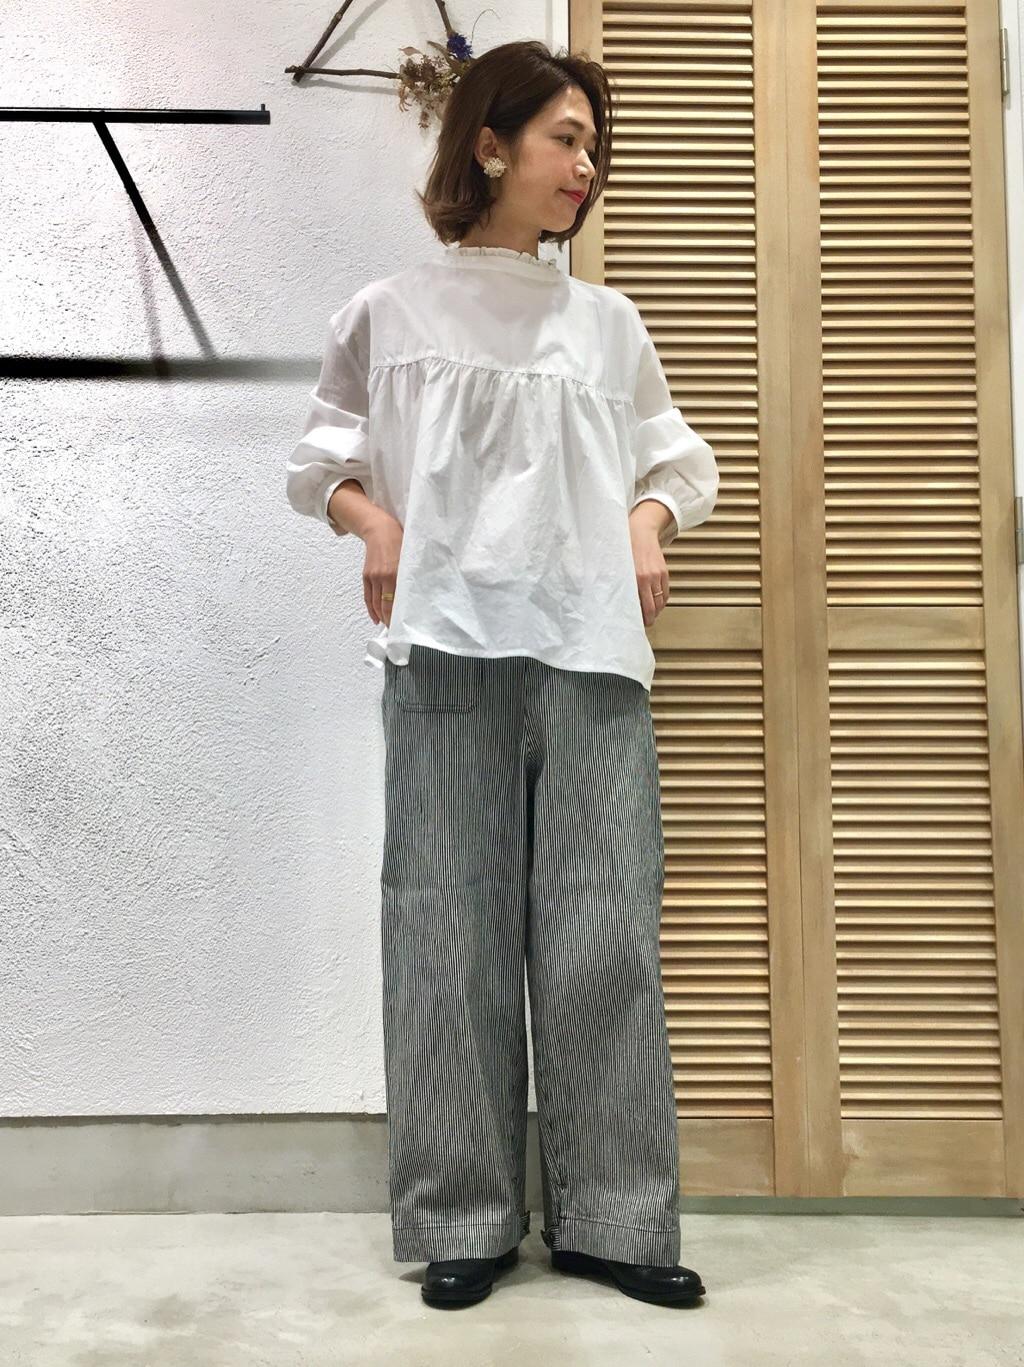 chambre de charme 横浜ジョイナス 身長:160cm 2021.02.05